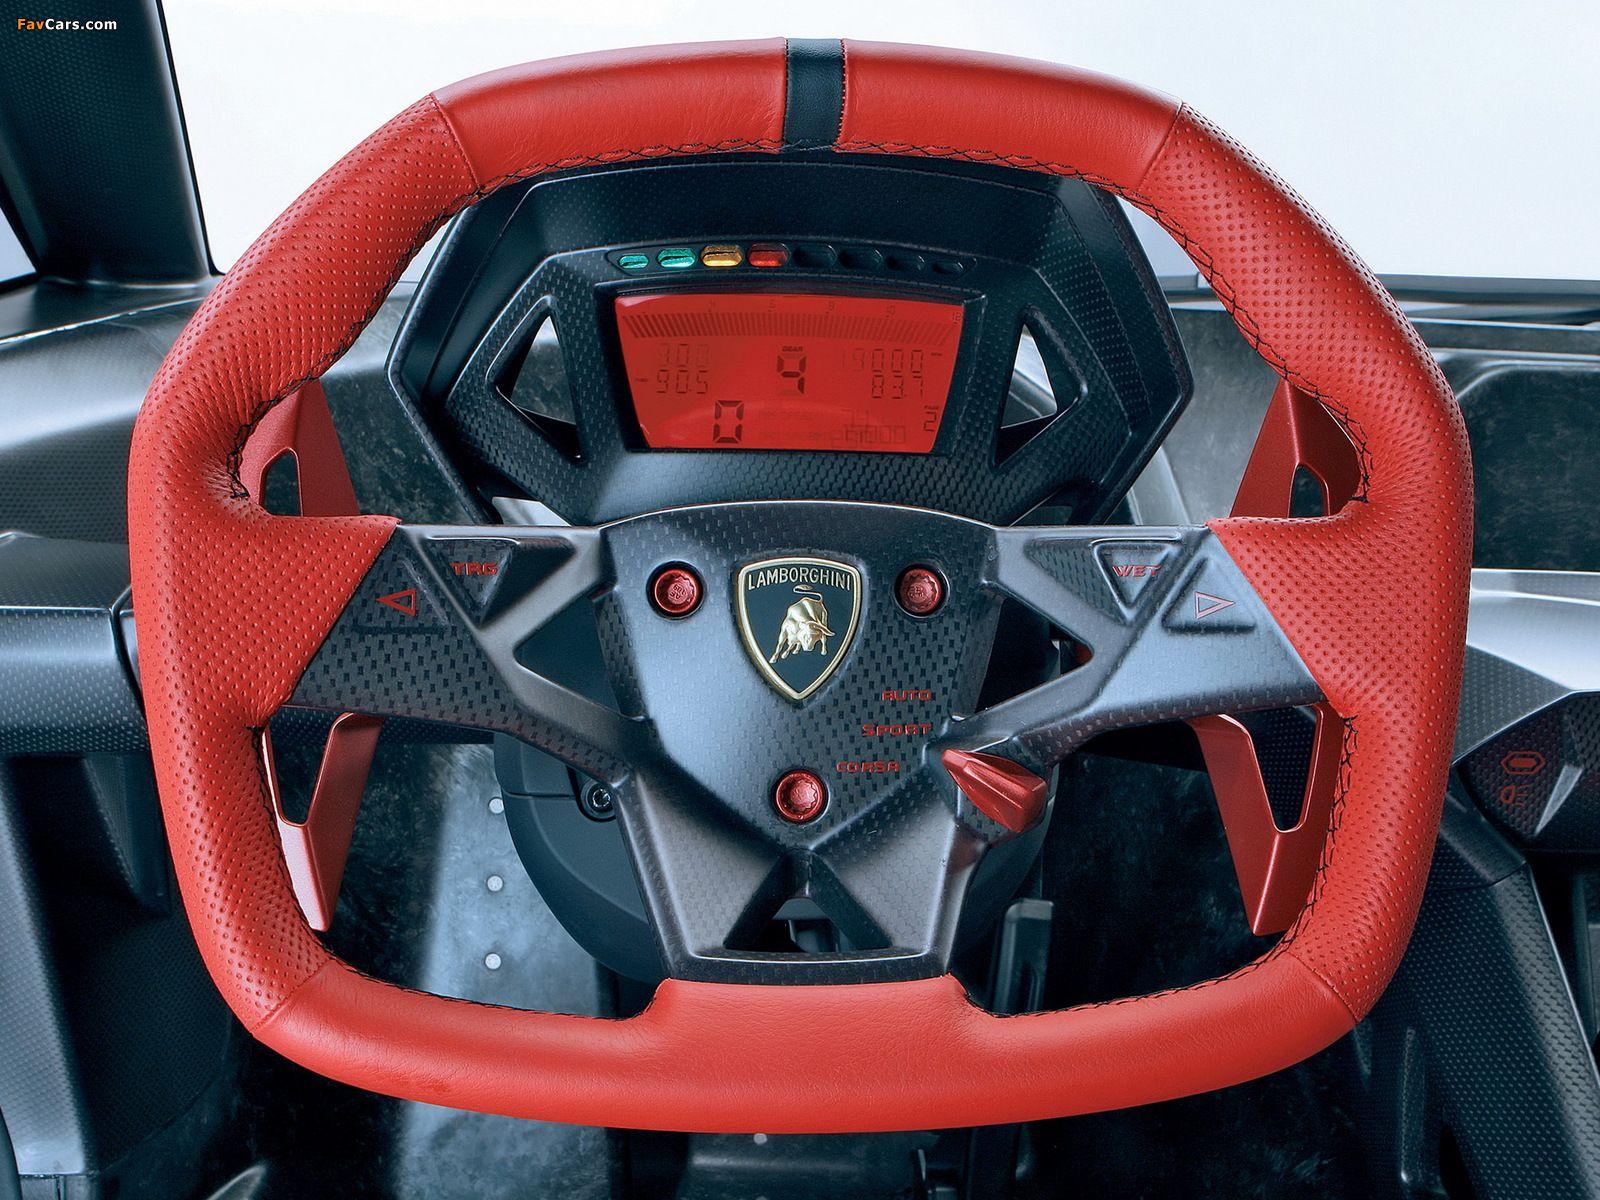 Lamborghini Sesto Elemento 2010 #lamborghinisestoelemento